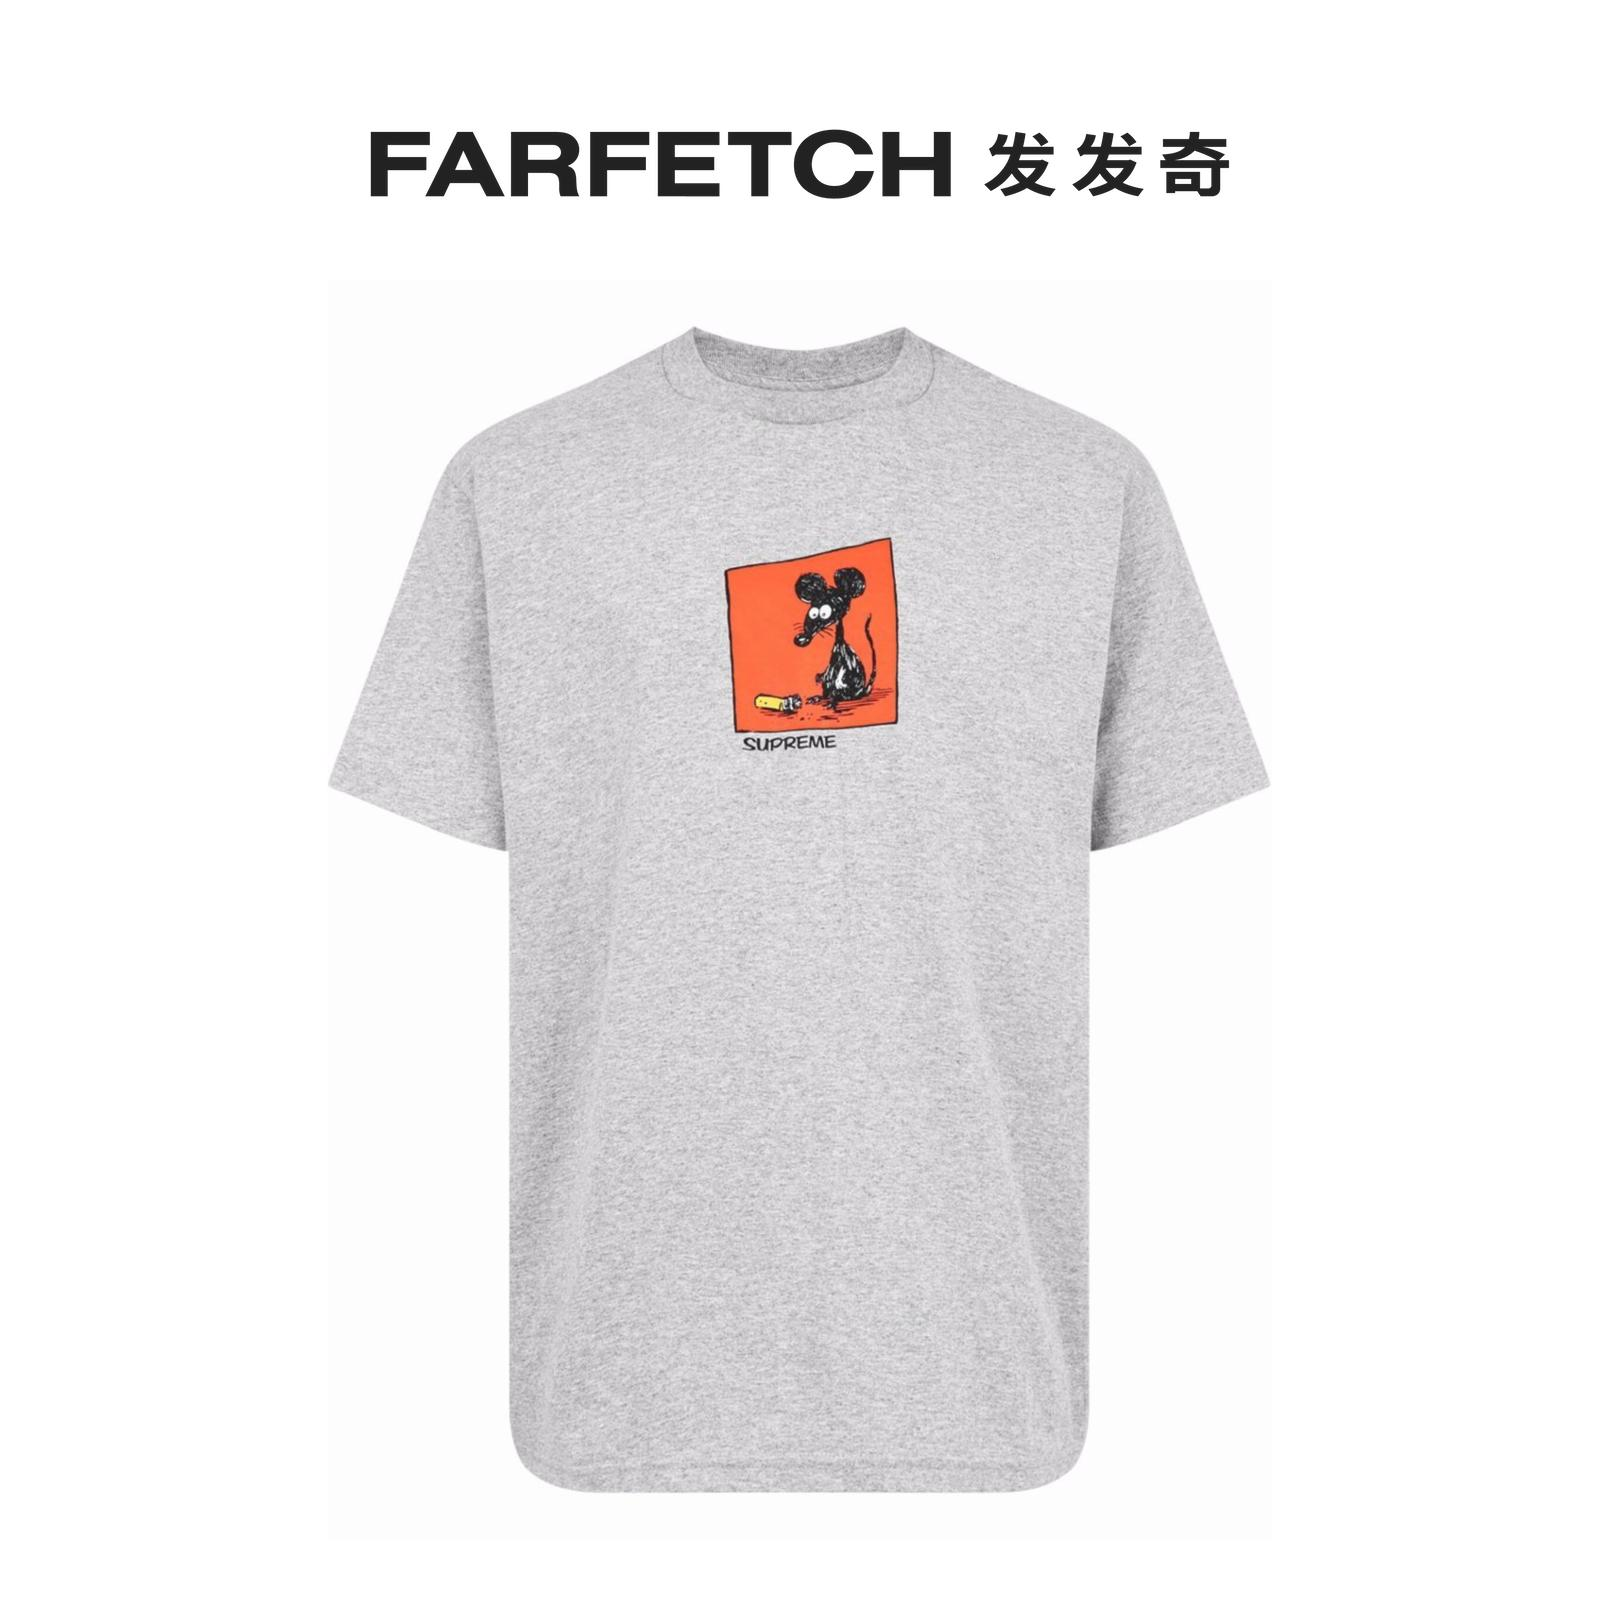 七夕礼物Supreme男士Mouse 印花T恤FARFETCH发发奇